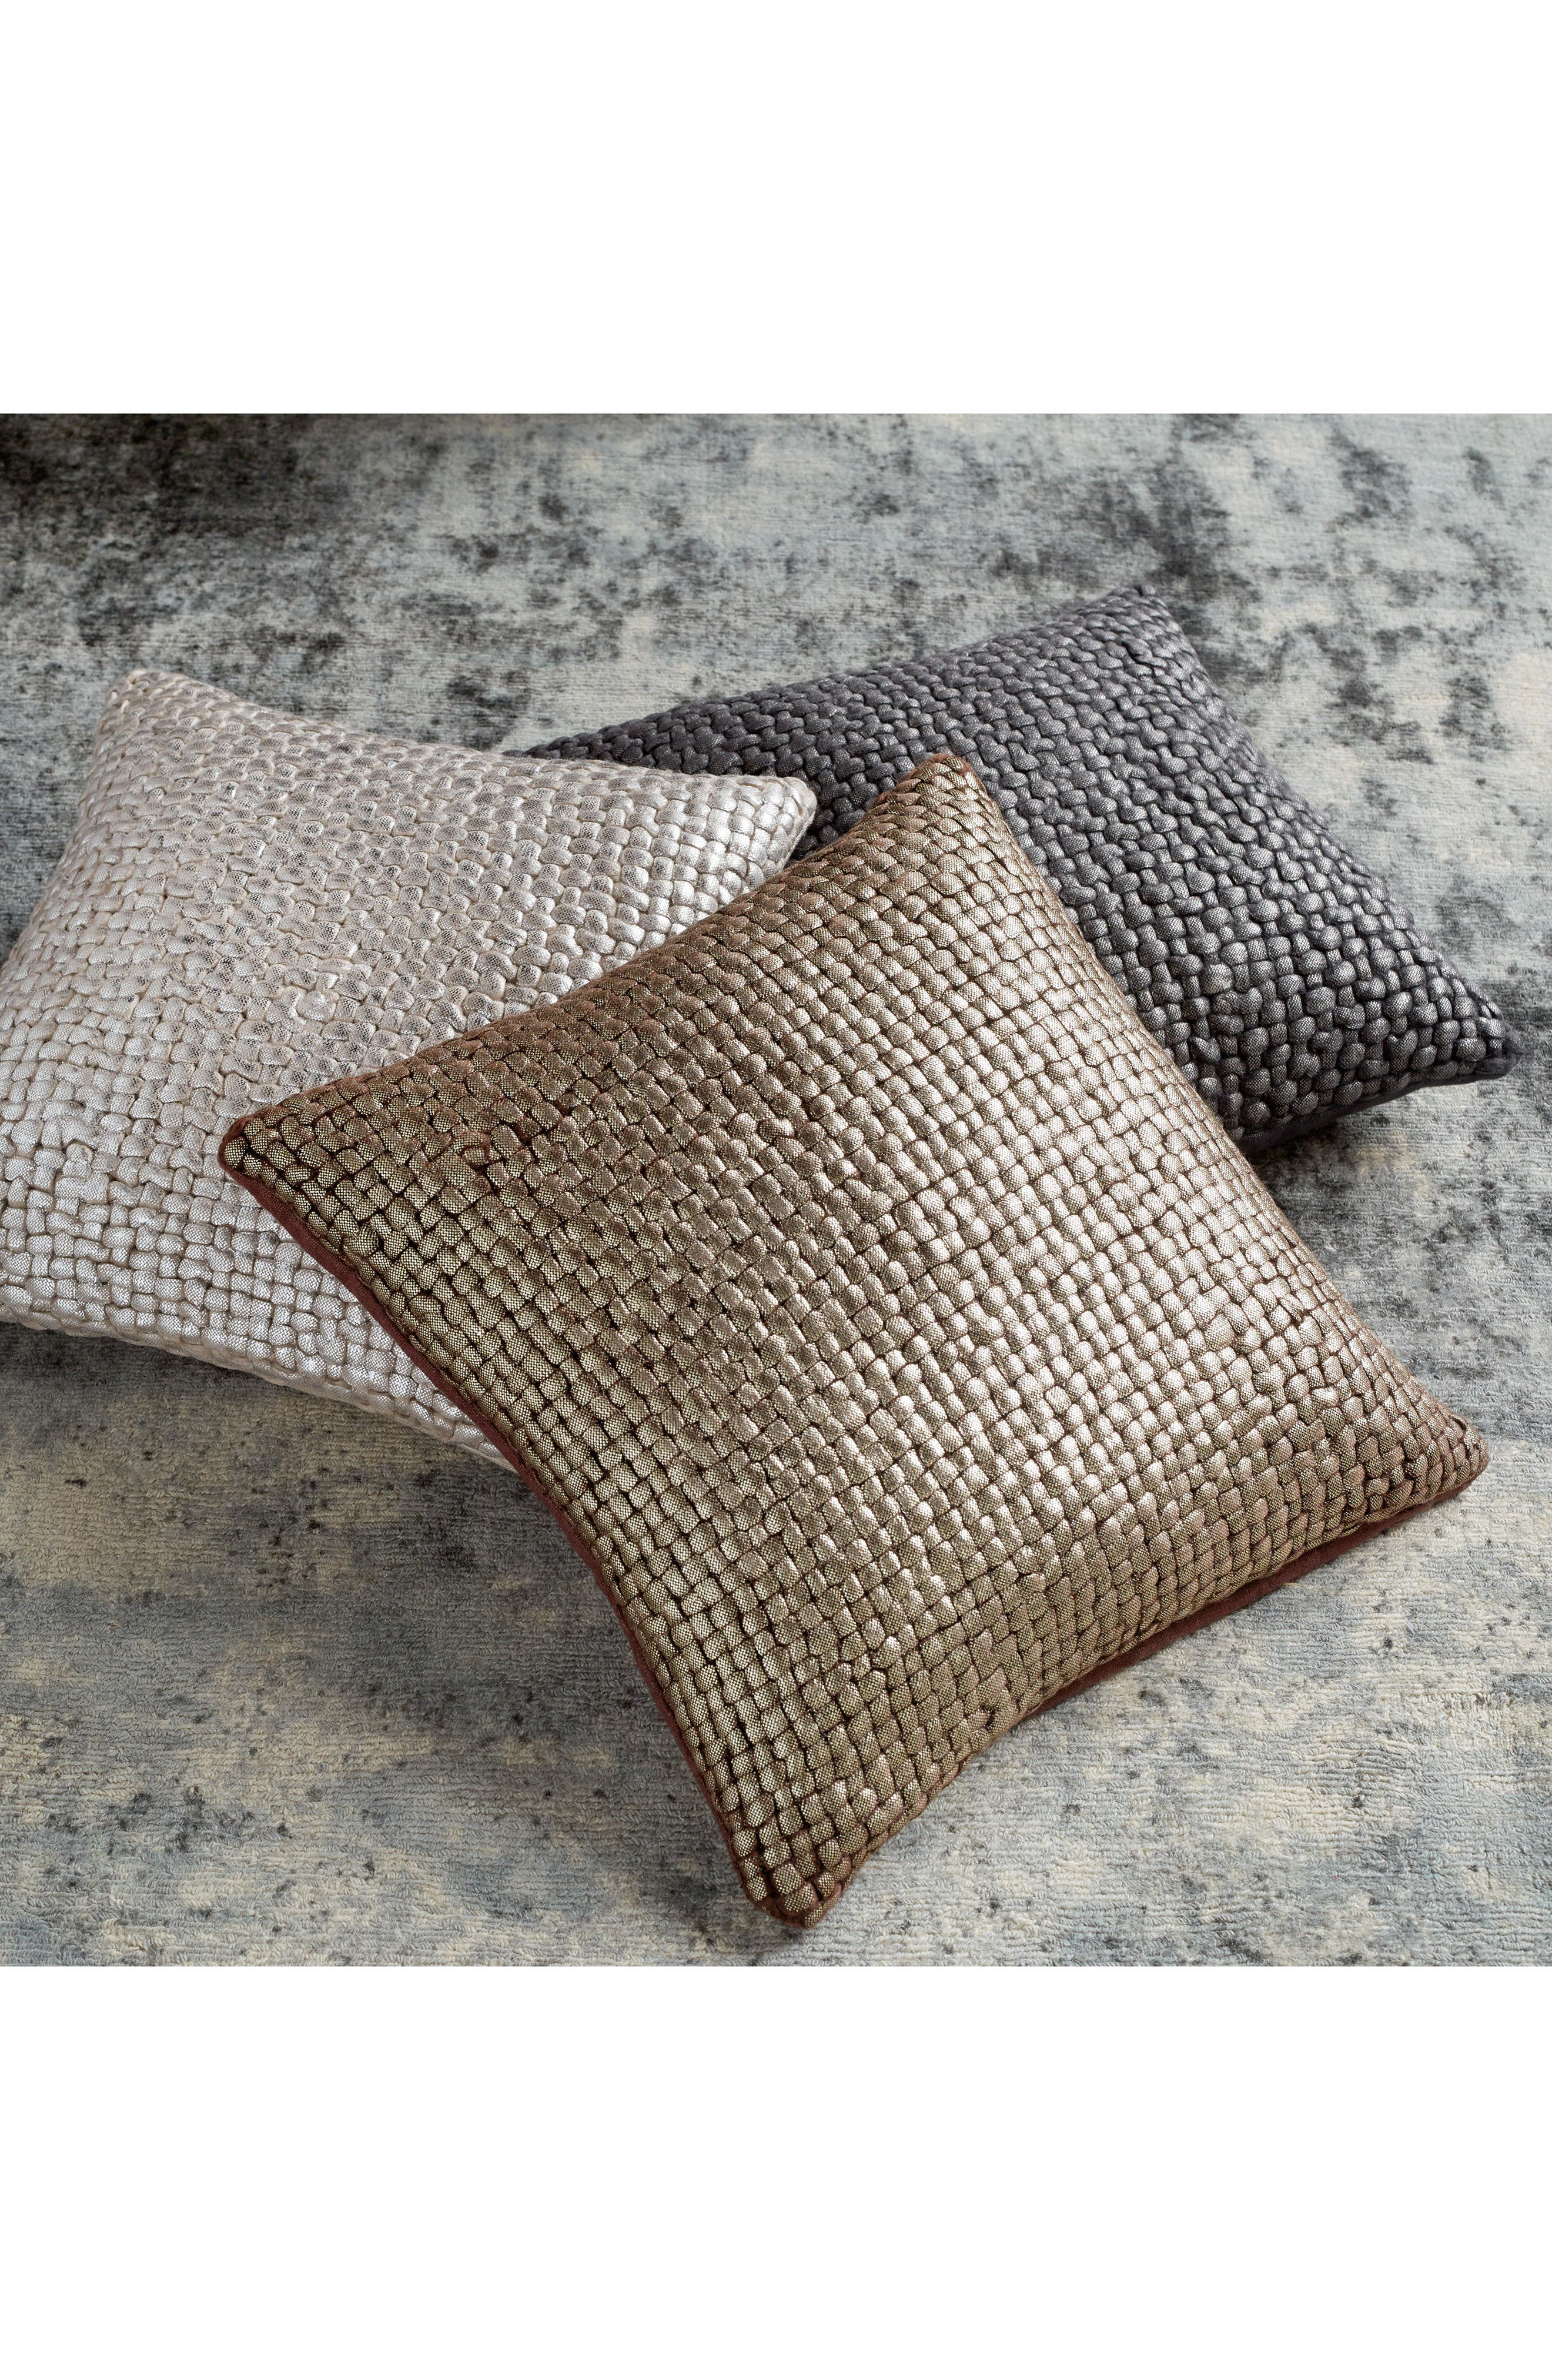 MICHAEL ARAM,                             Metallic Basket Weave Accent Pillow,                             Alternate thumbnail 2, color,                             CHOCOLATE